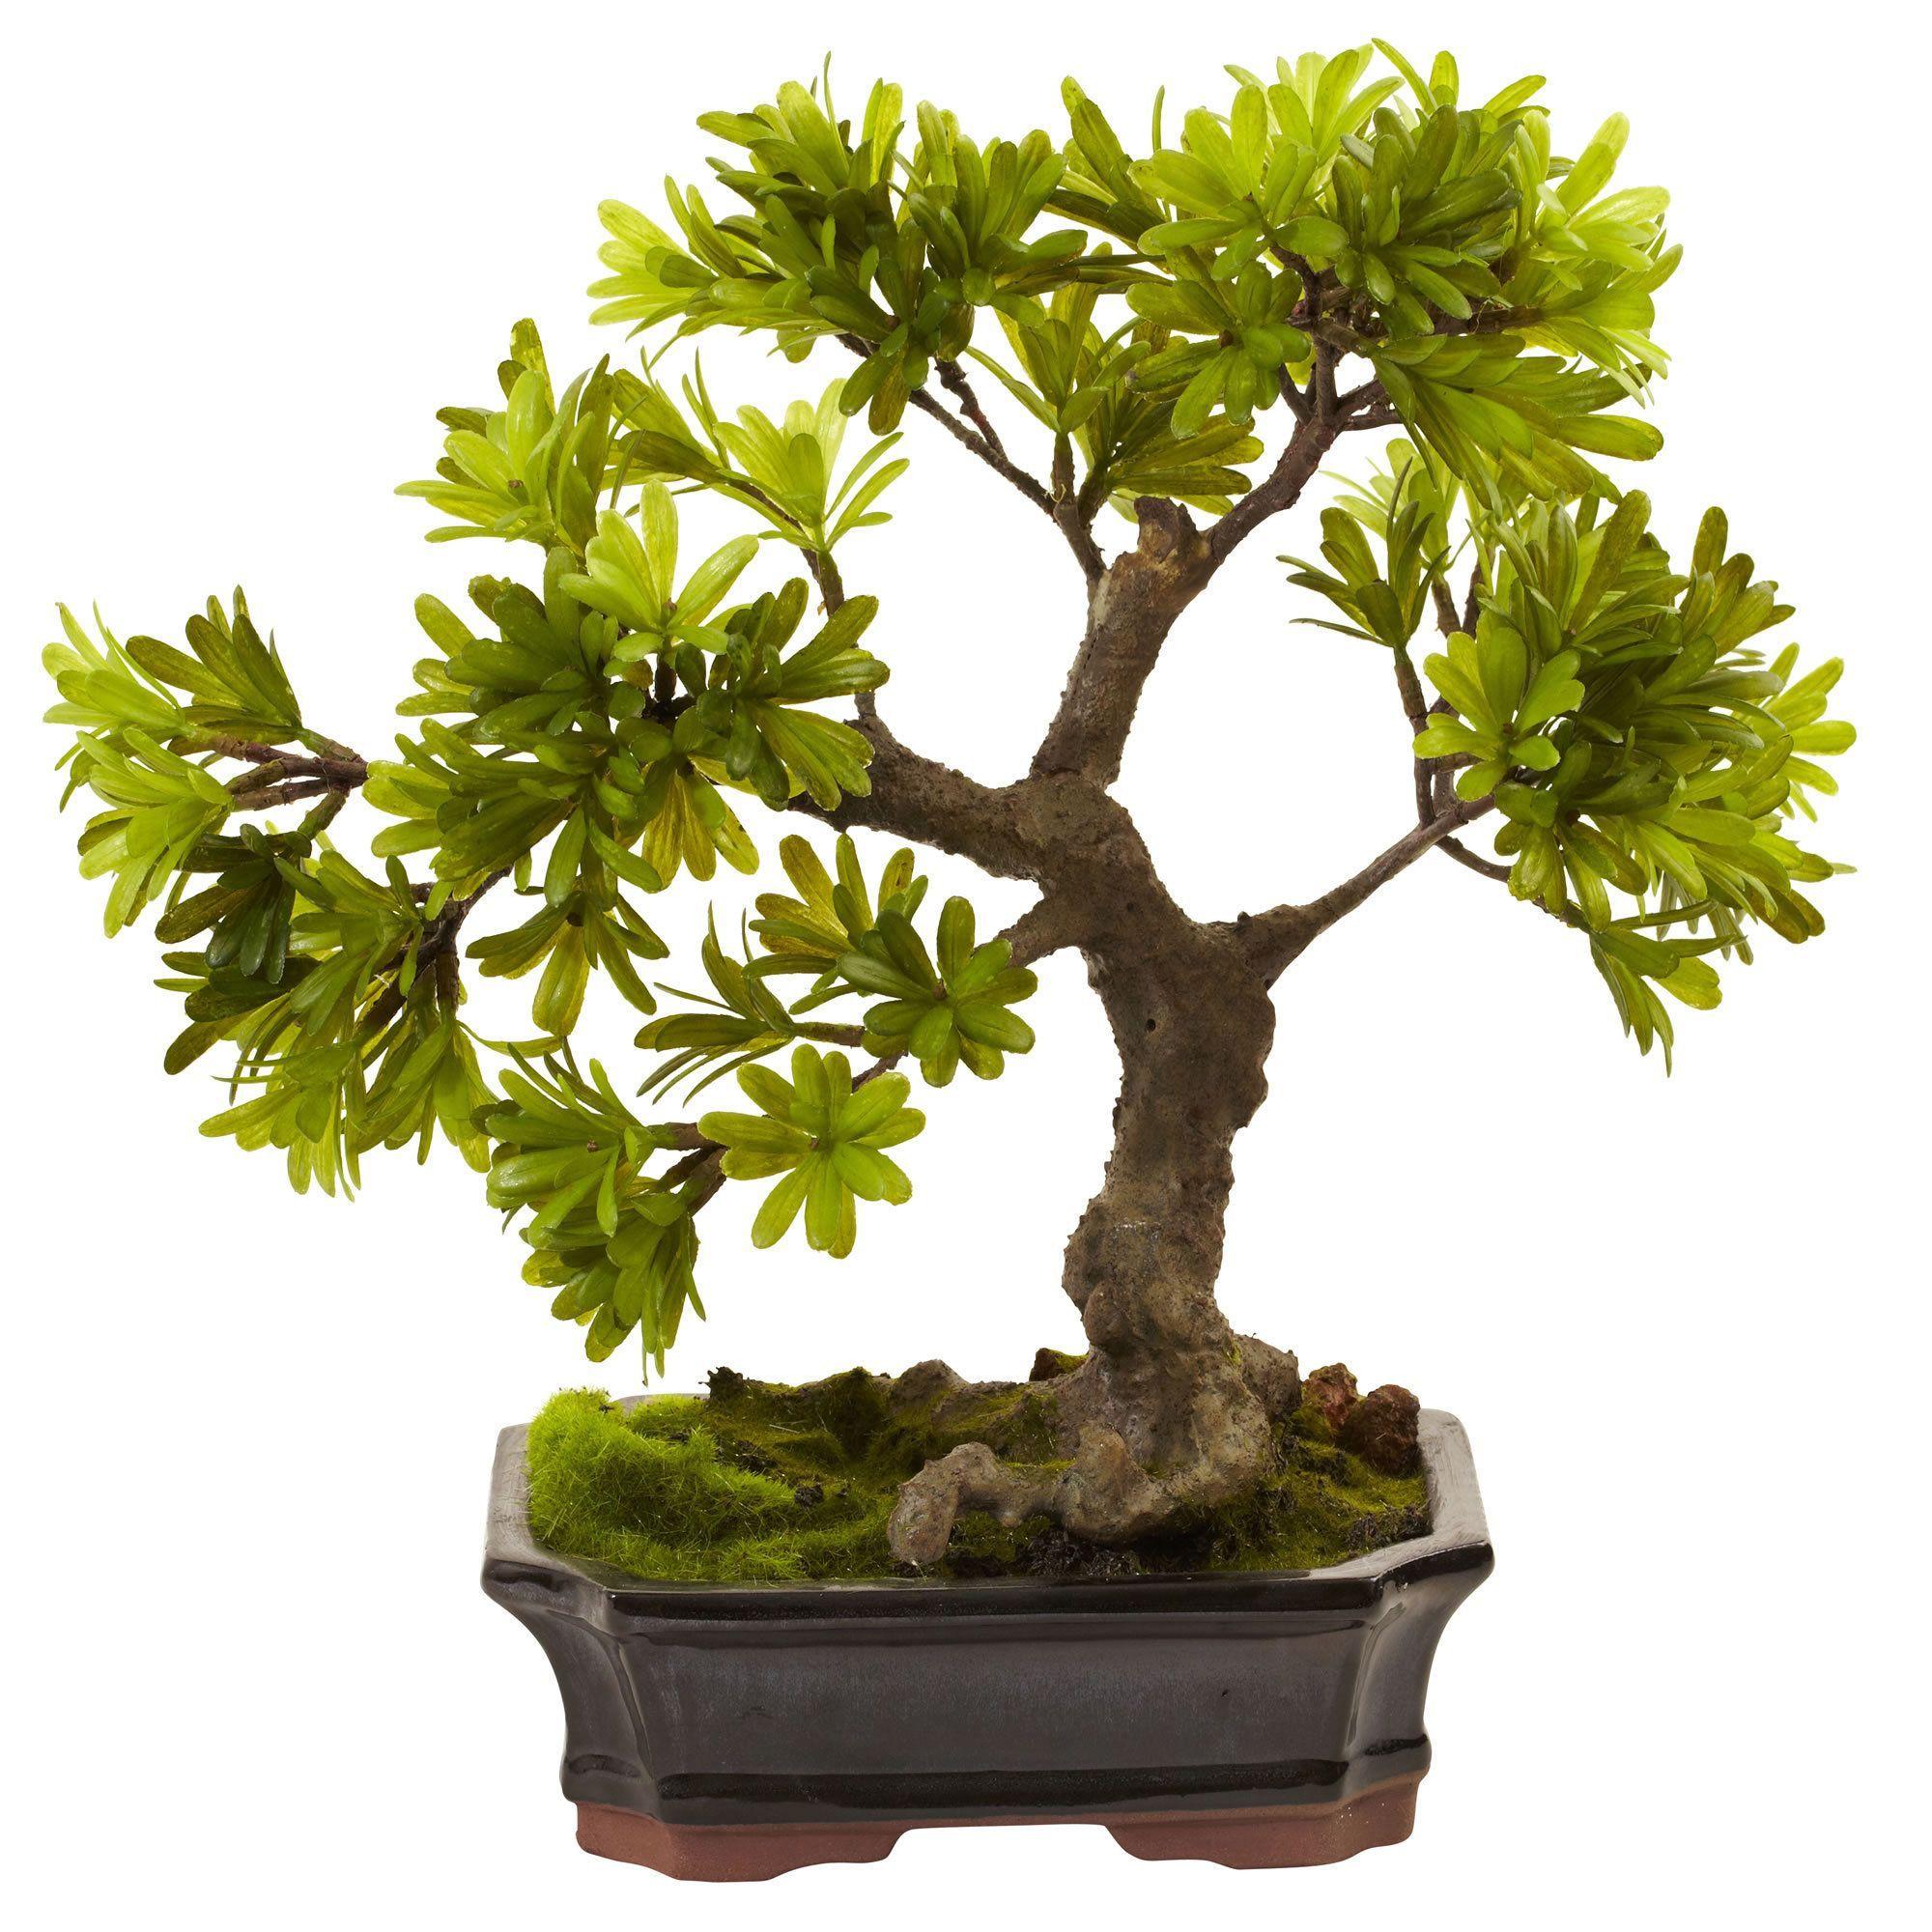 Our Best Decorative Accessories Deals Podocarpus Bonsai Bonsai Tree Indoor Bonsai Tree